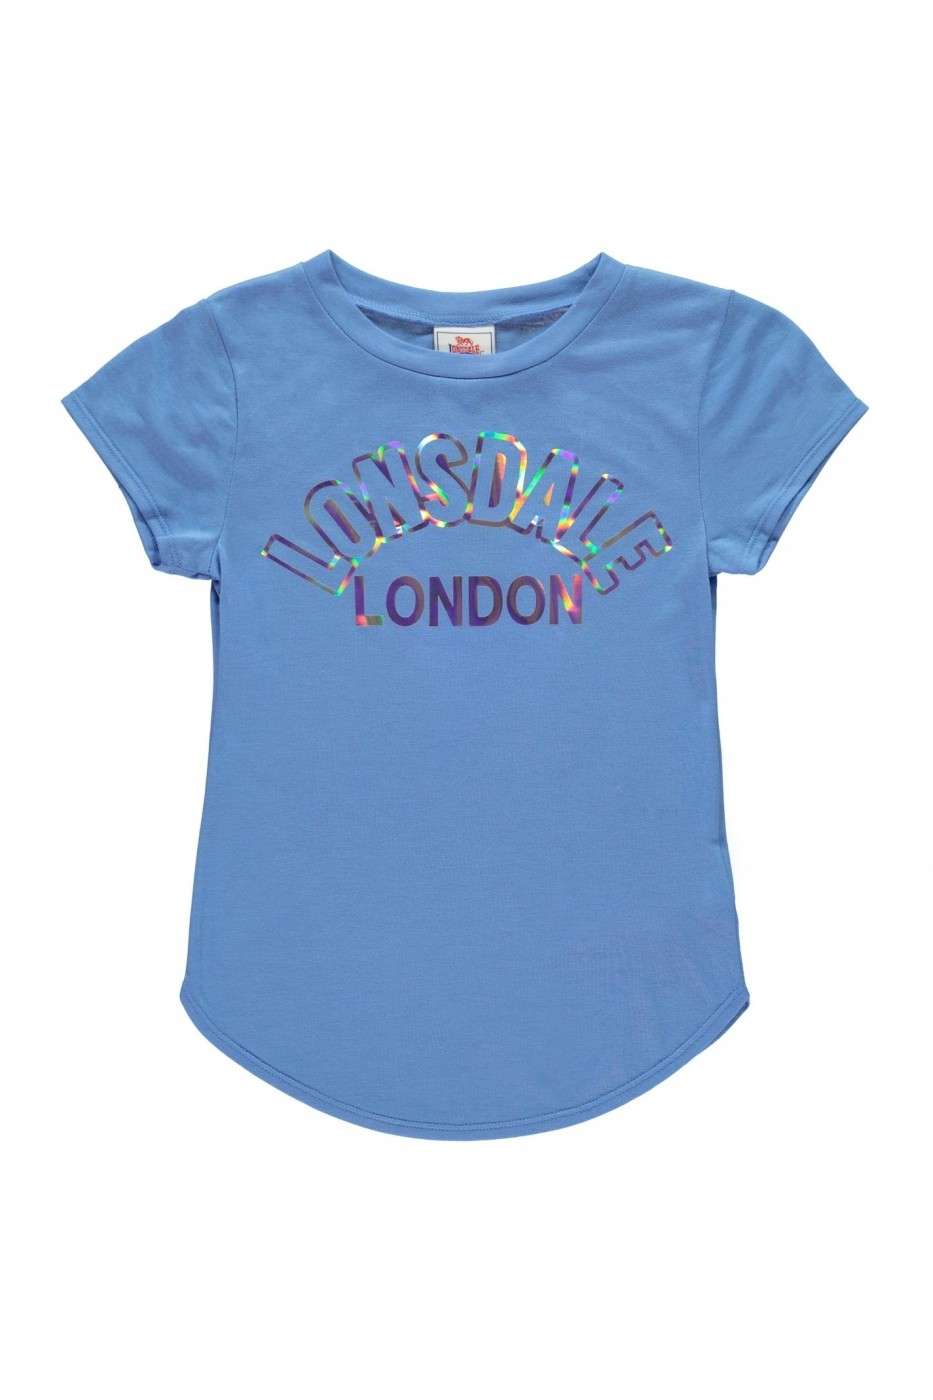 bfc05b1da5 Lonsdale Póló ARC-59844618 Kék - FashionUP!